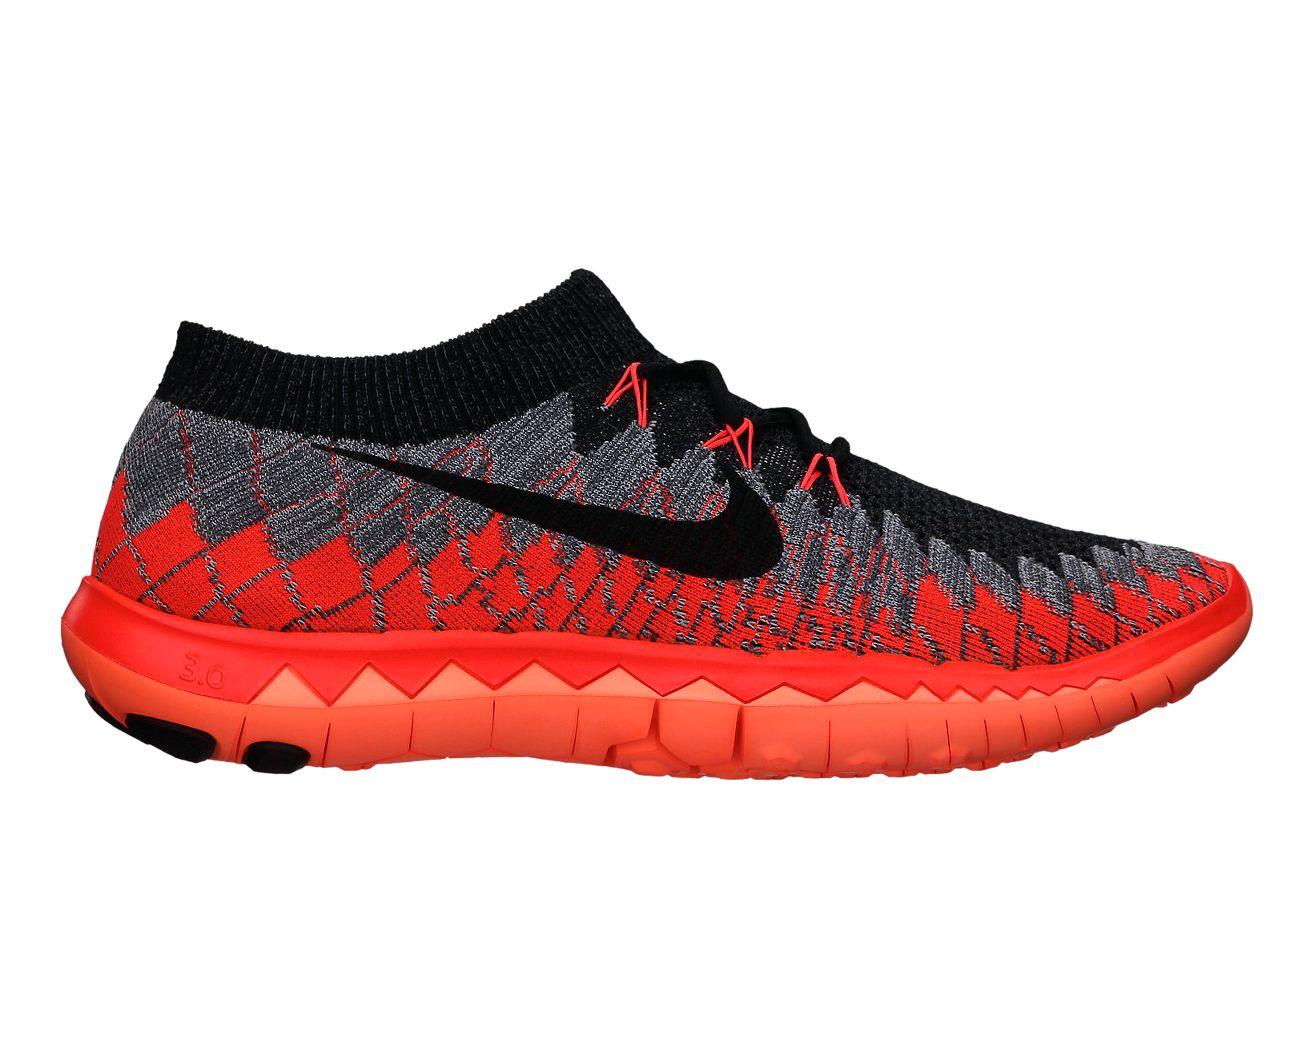 Nike Free Flyknit 3.0 Mens Nikes Discount Greece